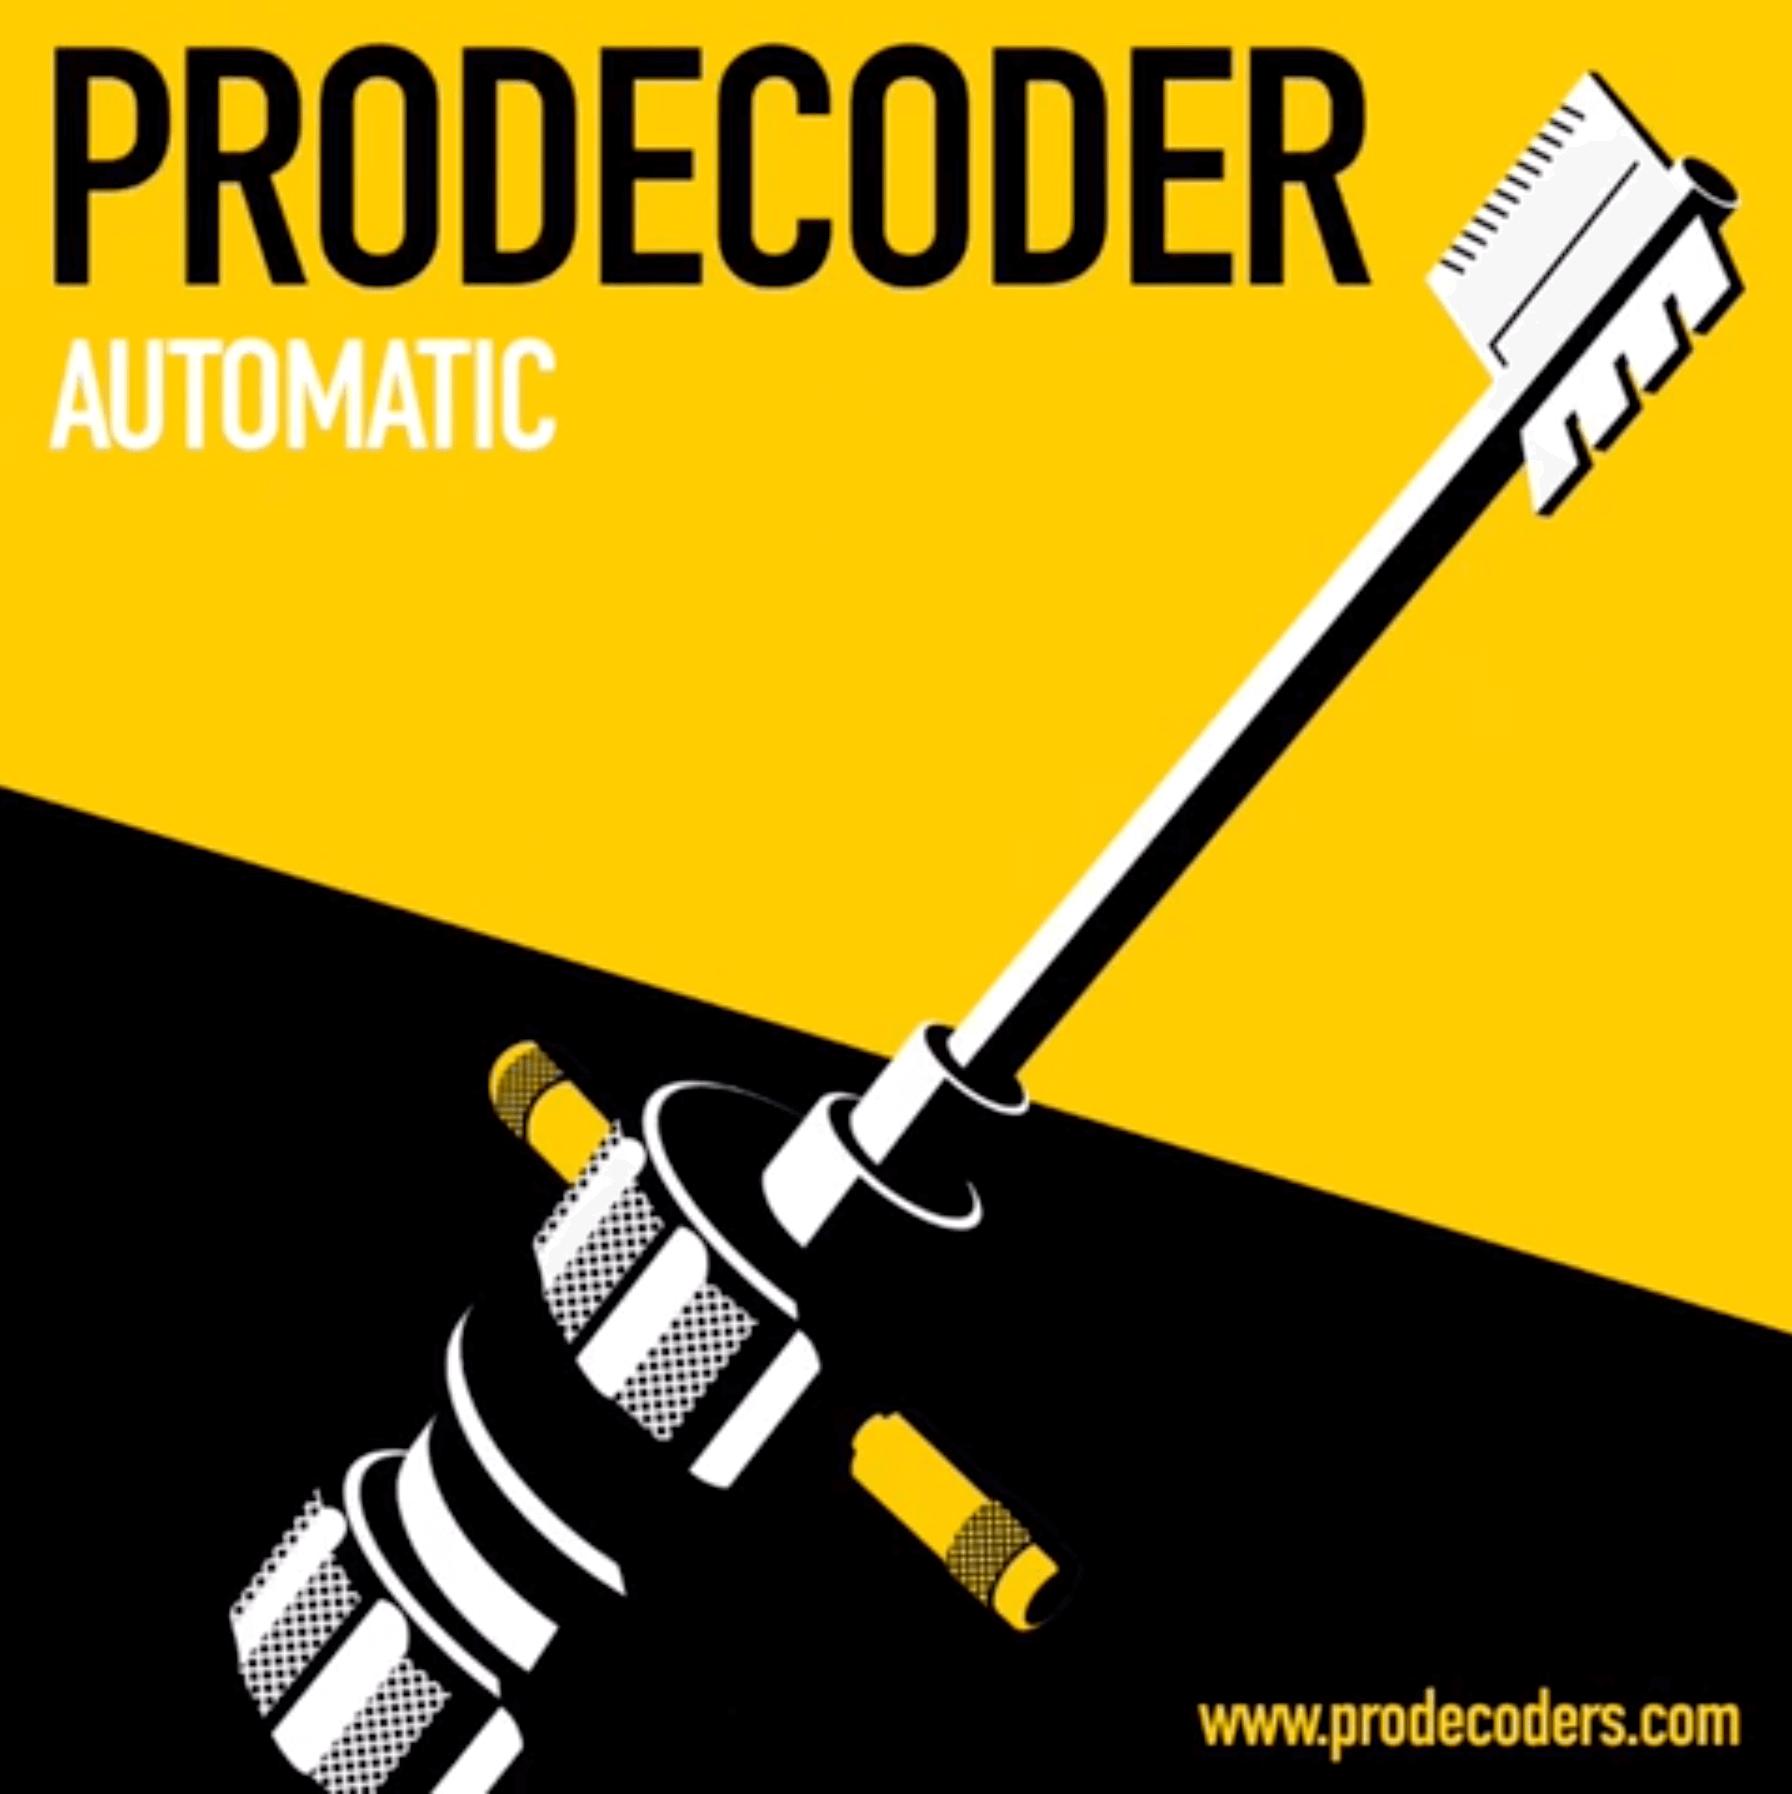 prodecoder automatic